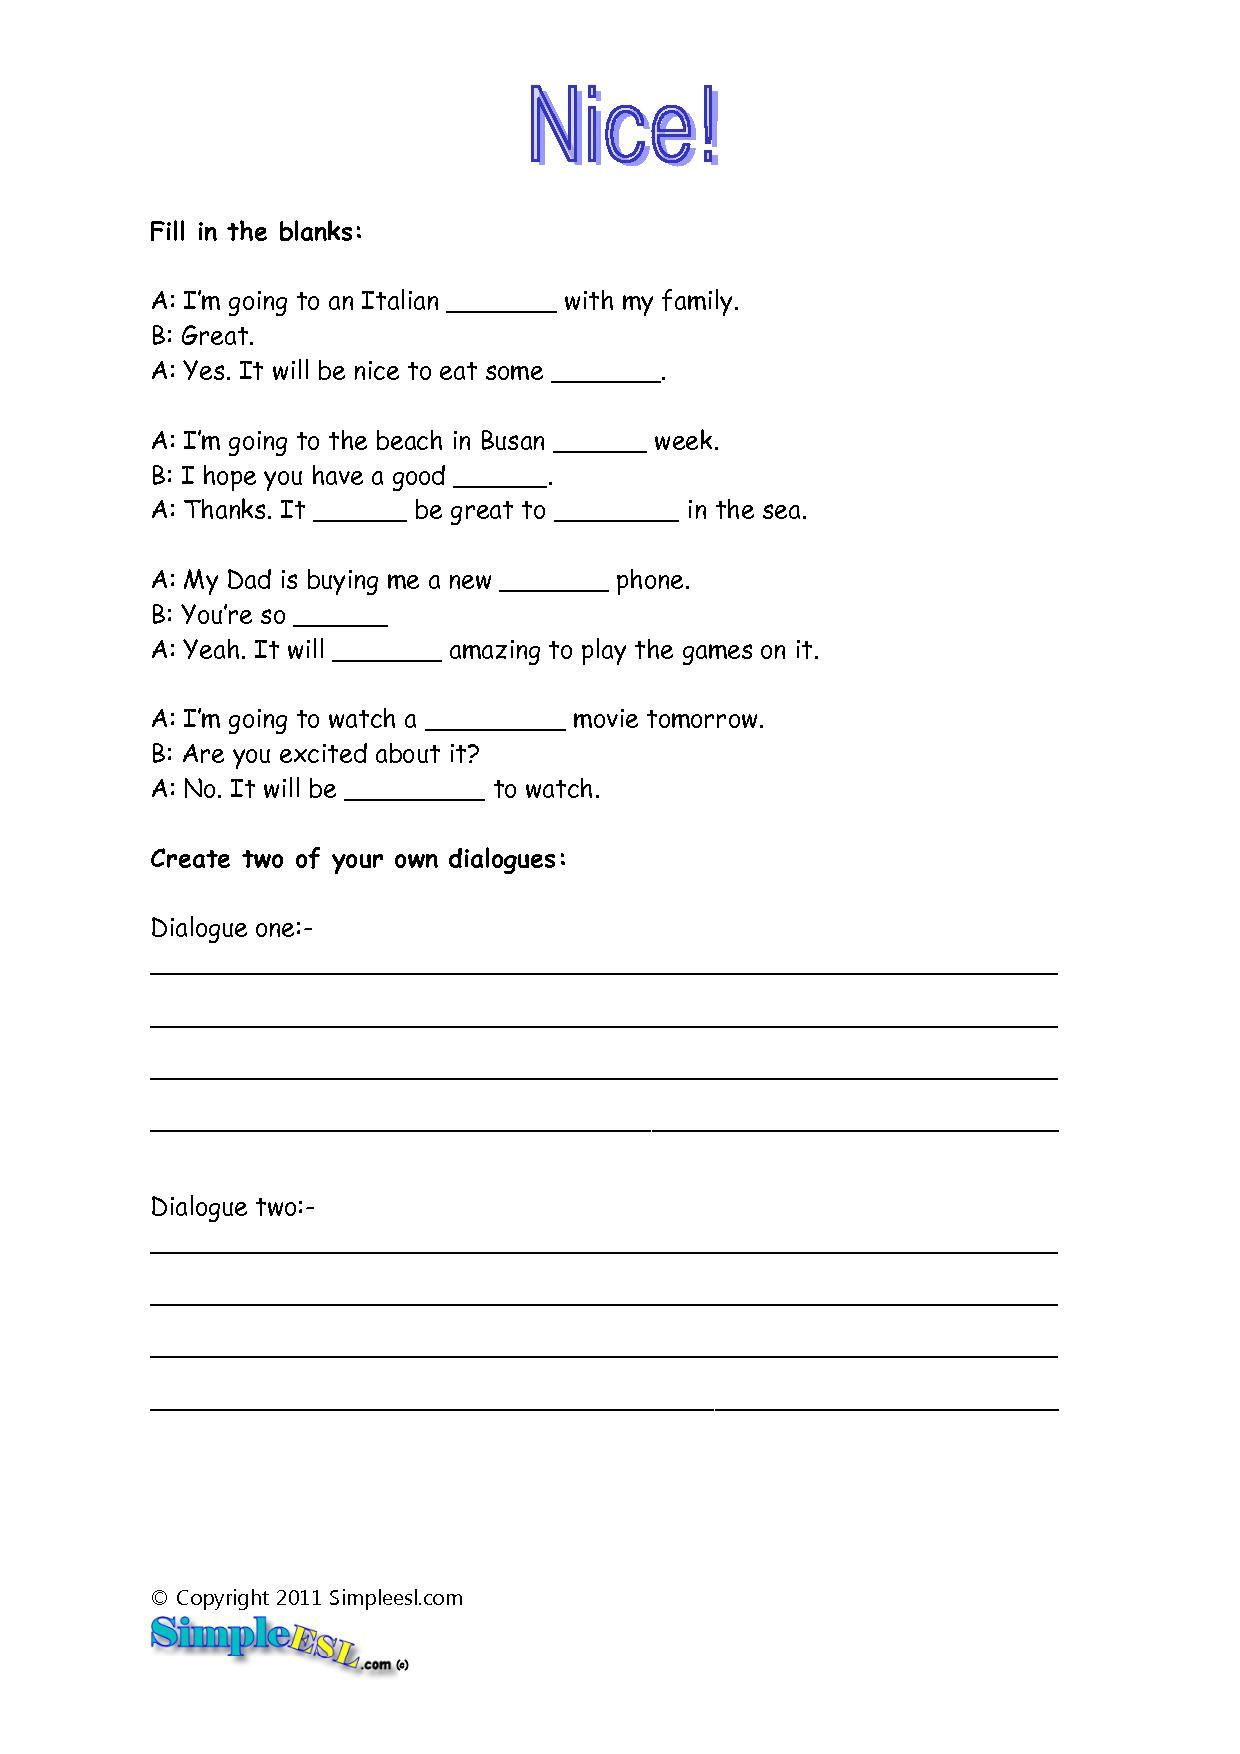 worksheet Printable Language Arts Worksheets printable english language arts worksheets from super teacher description utikylifi xlx